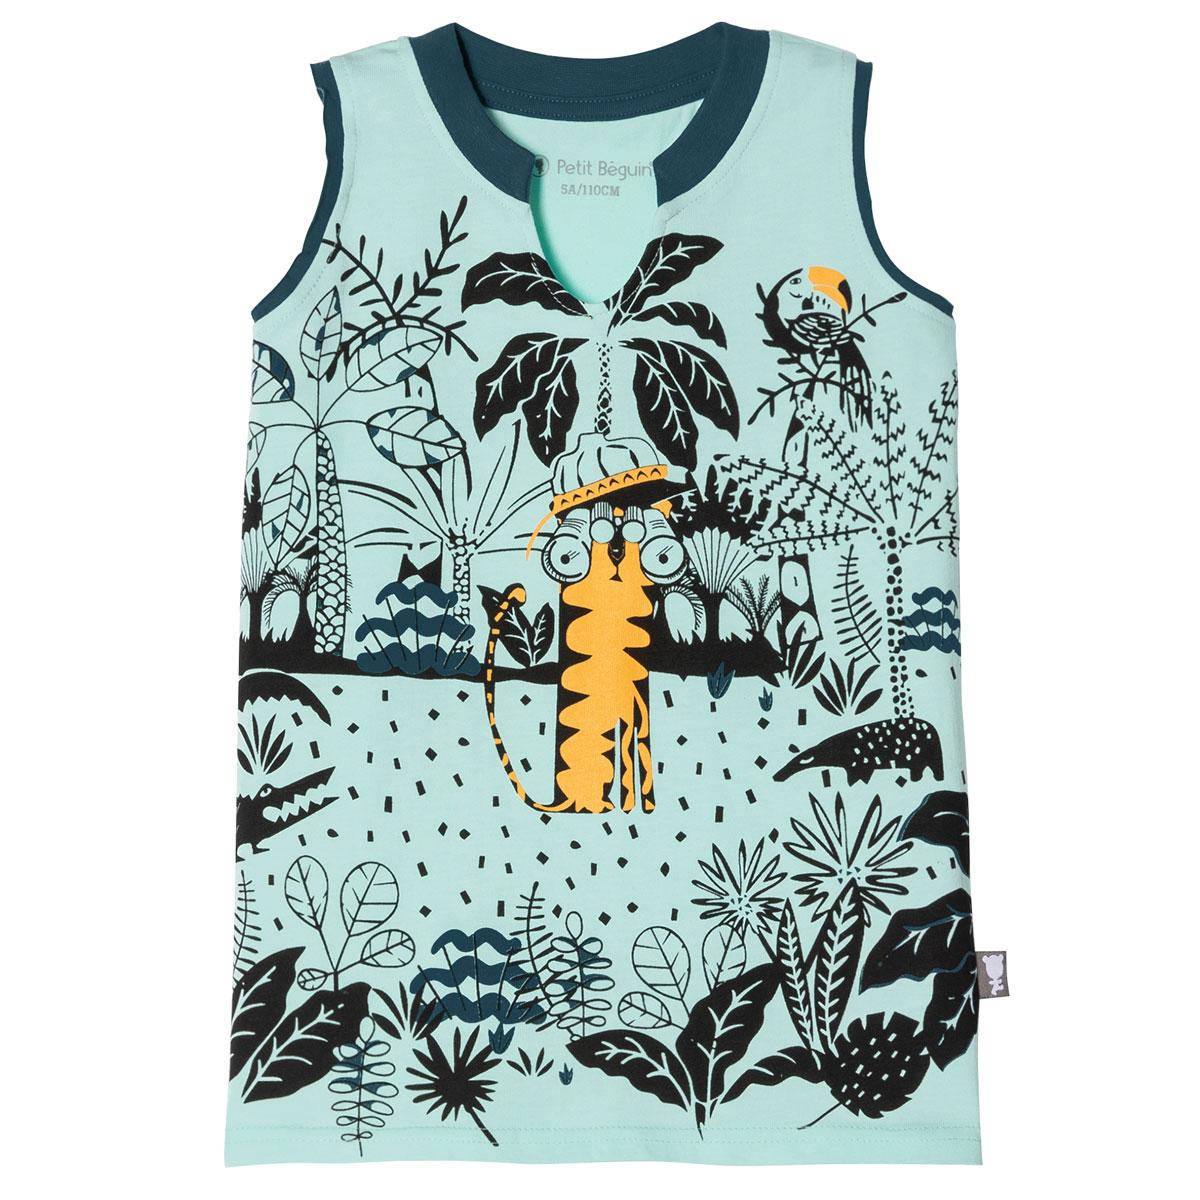 pyjama-debardeur-short-2-pieces-enfant-garcon-explorateur haut